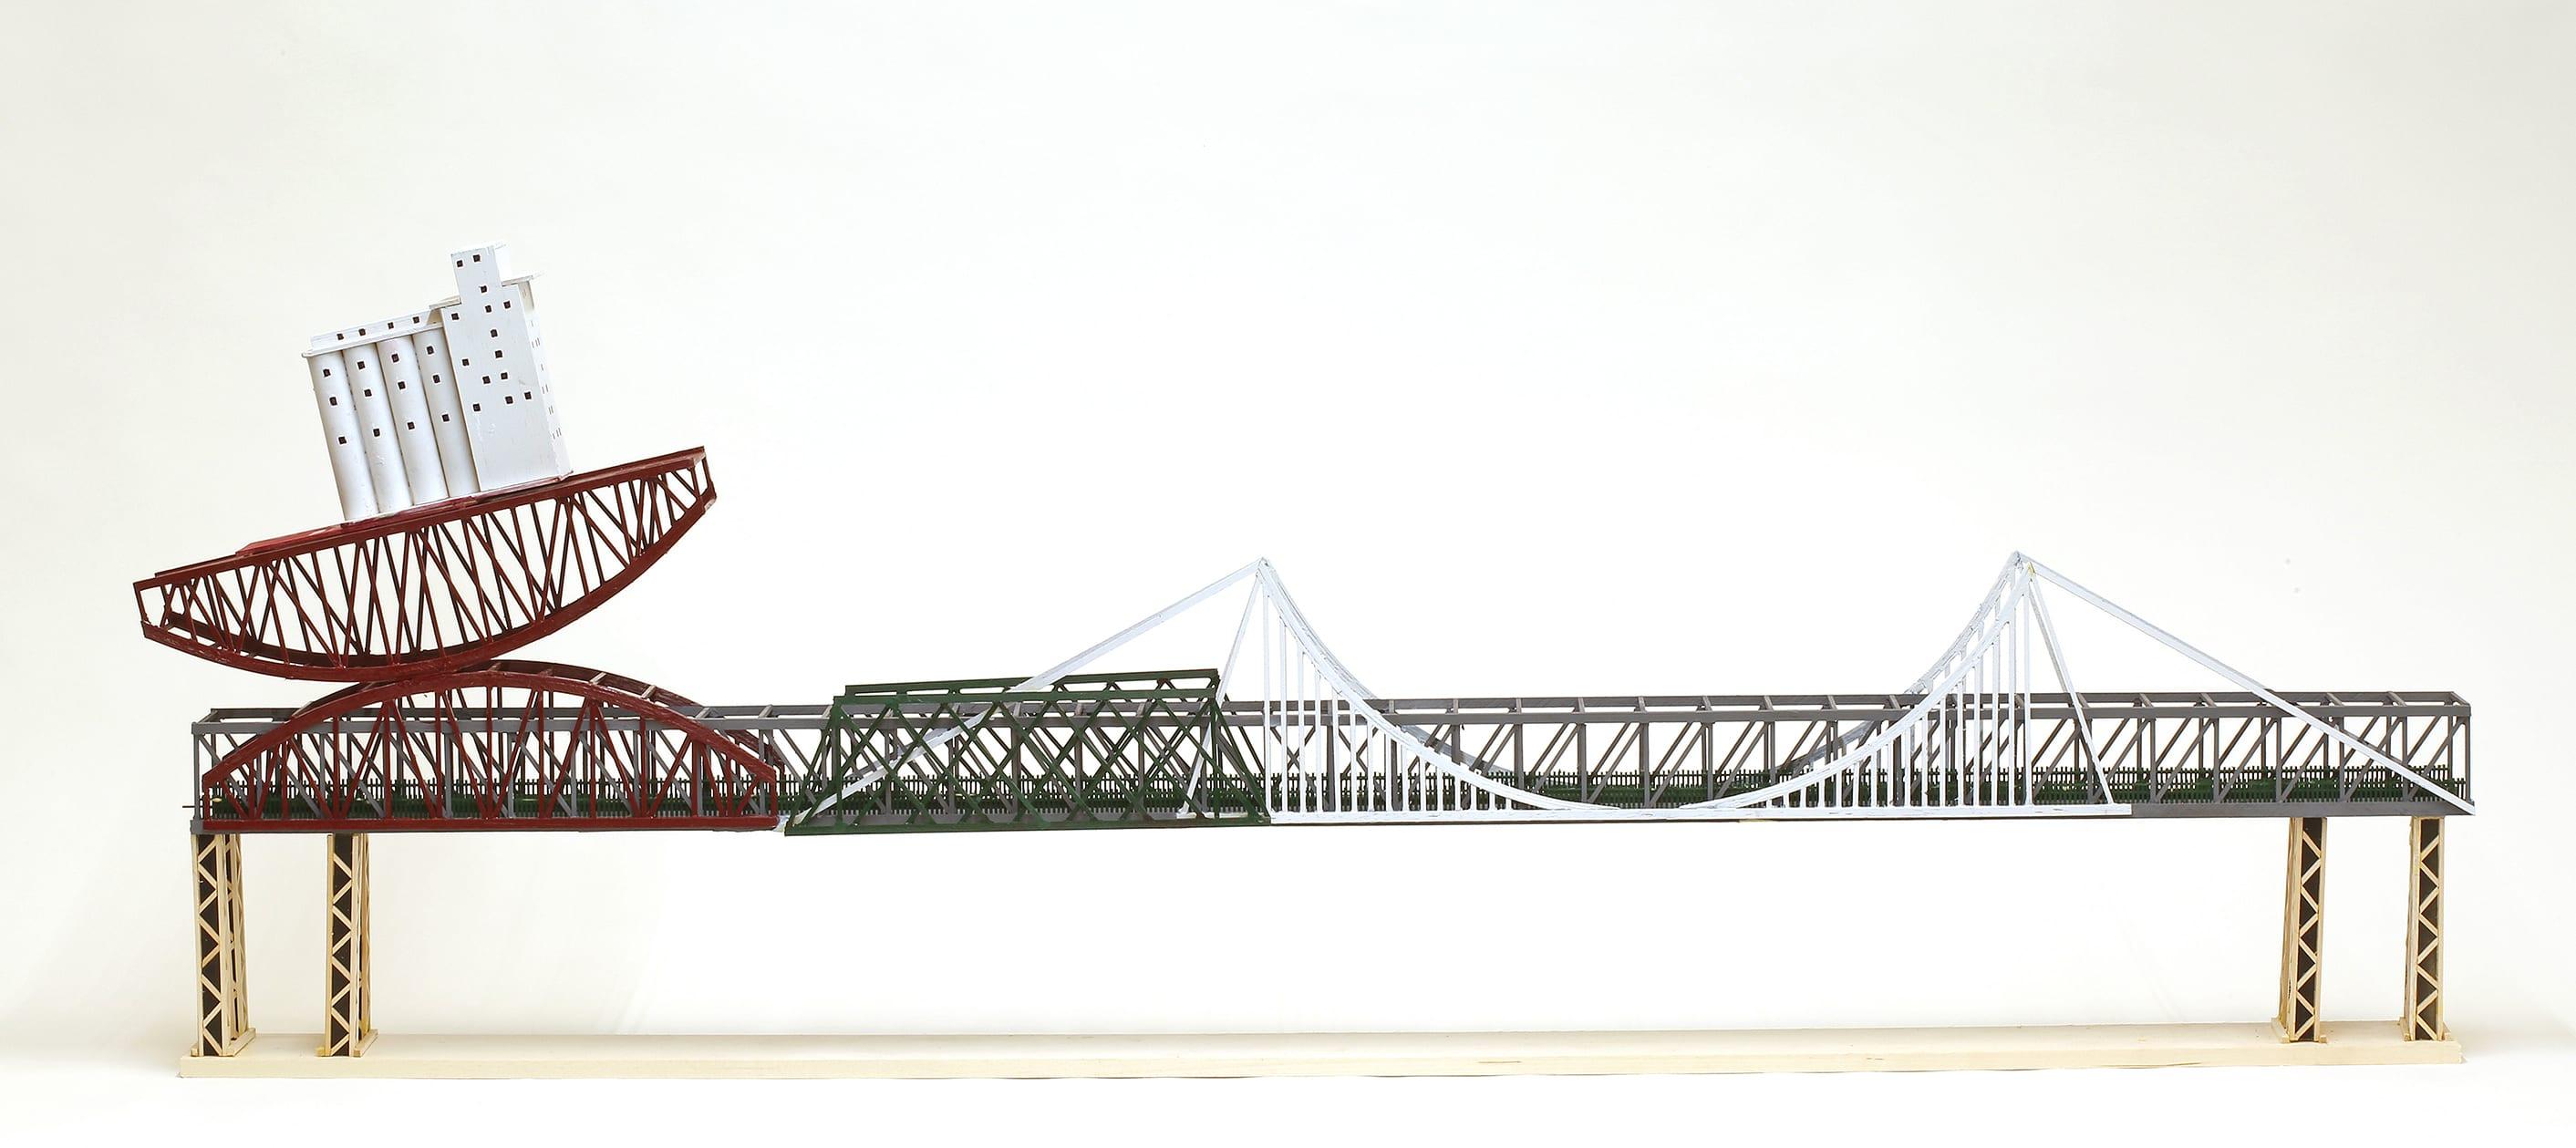 A RENDERING OF A BRIDGE